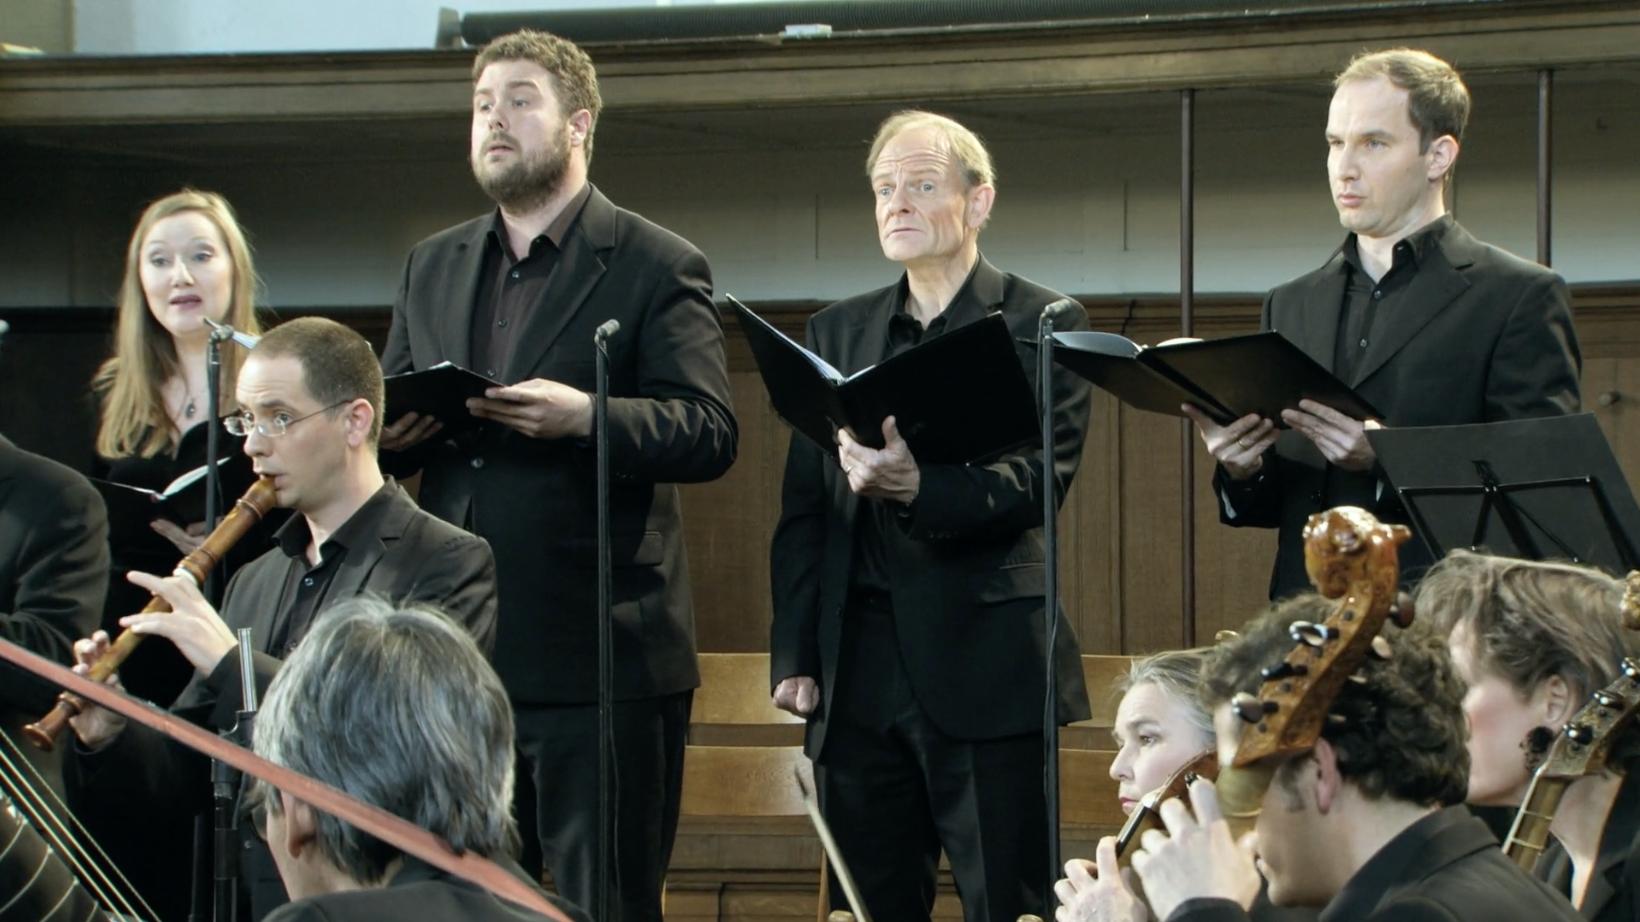 ALL OF BACH BWV 106 Gesangs-Solisten von links: Dorothee Mields soprano, Alex Potter alto, Charles Daniels tenor, Tobias Berndt bass.